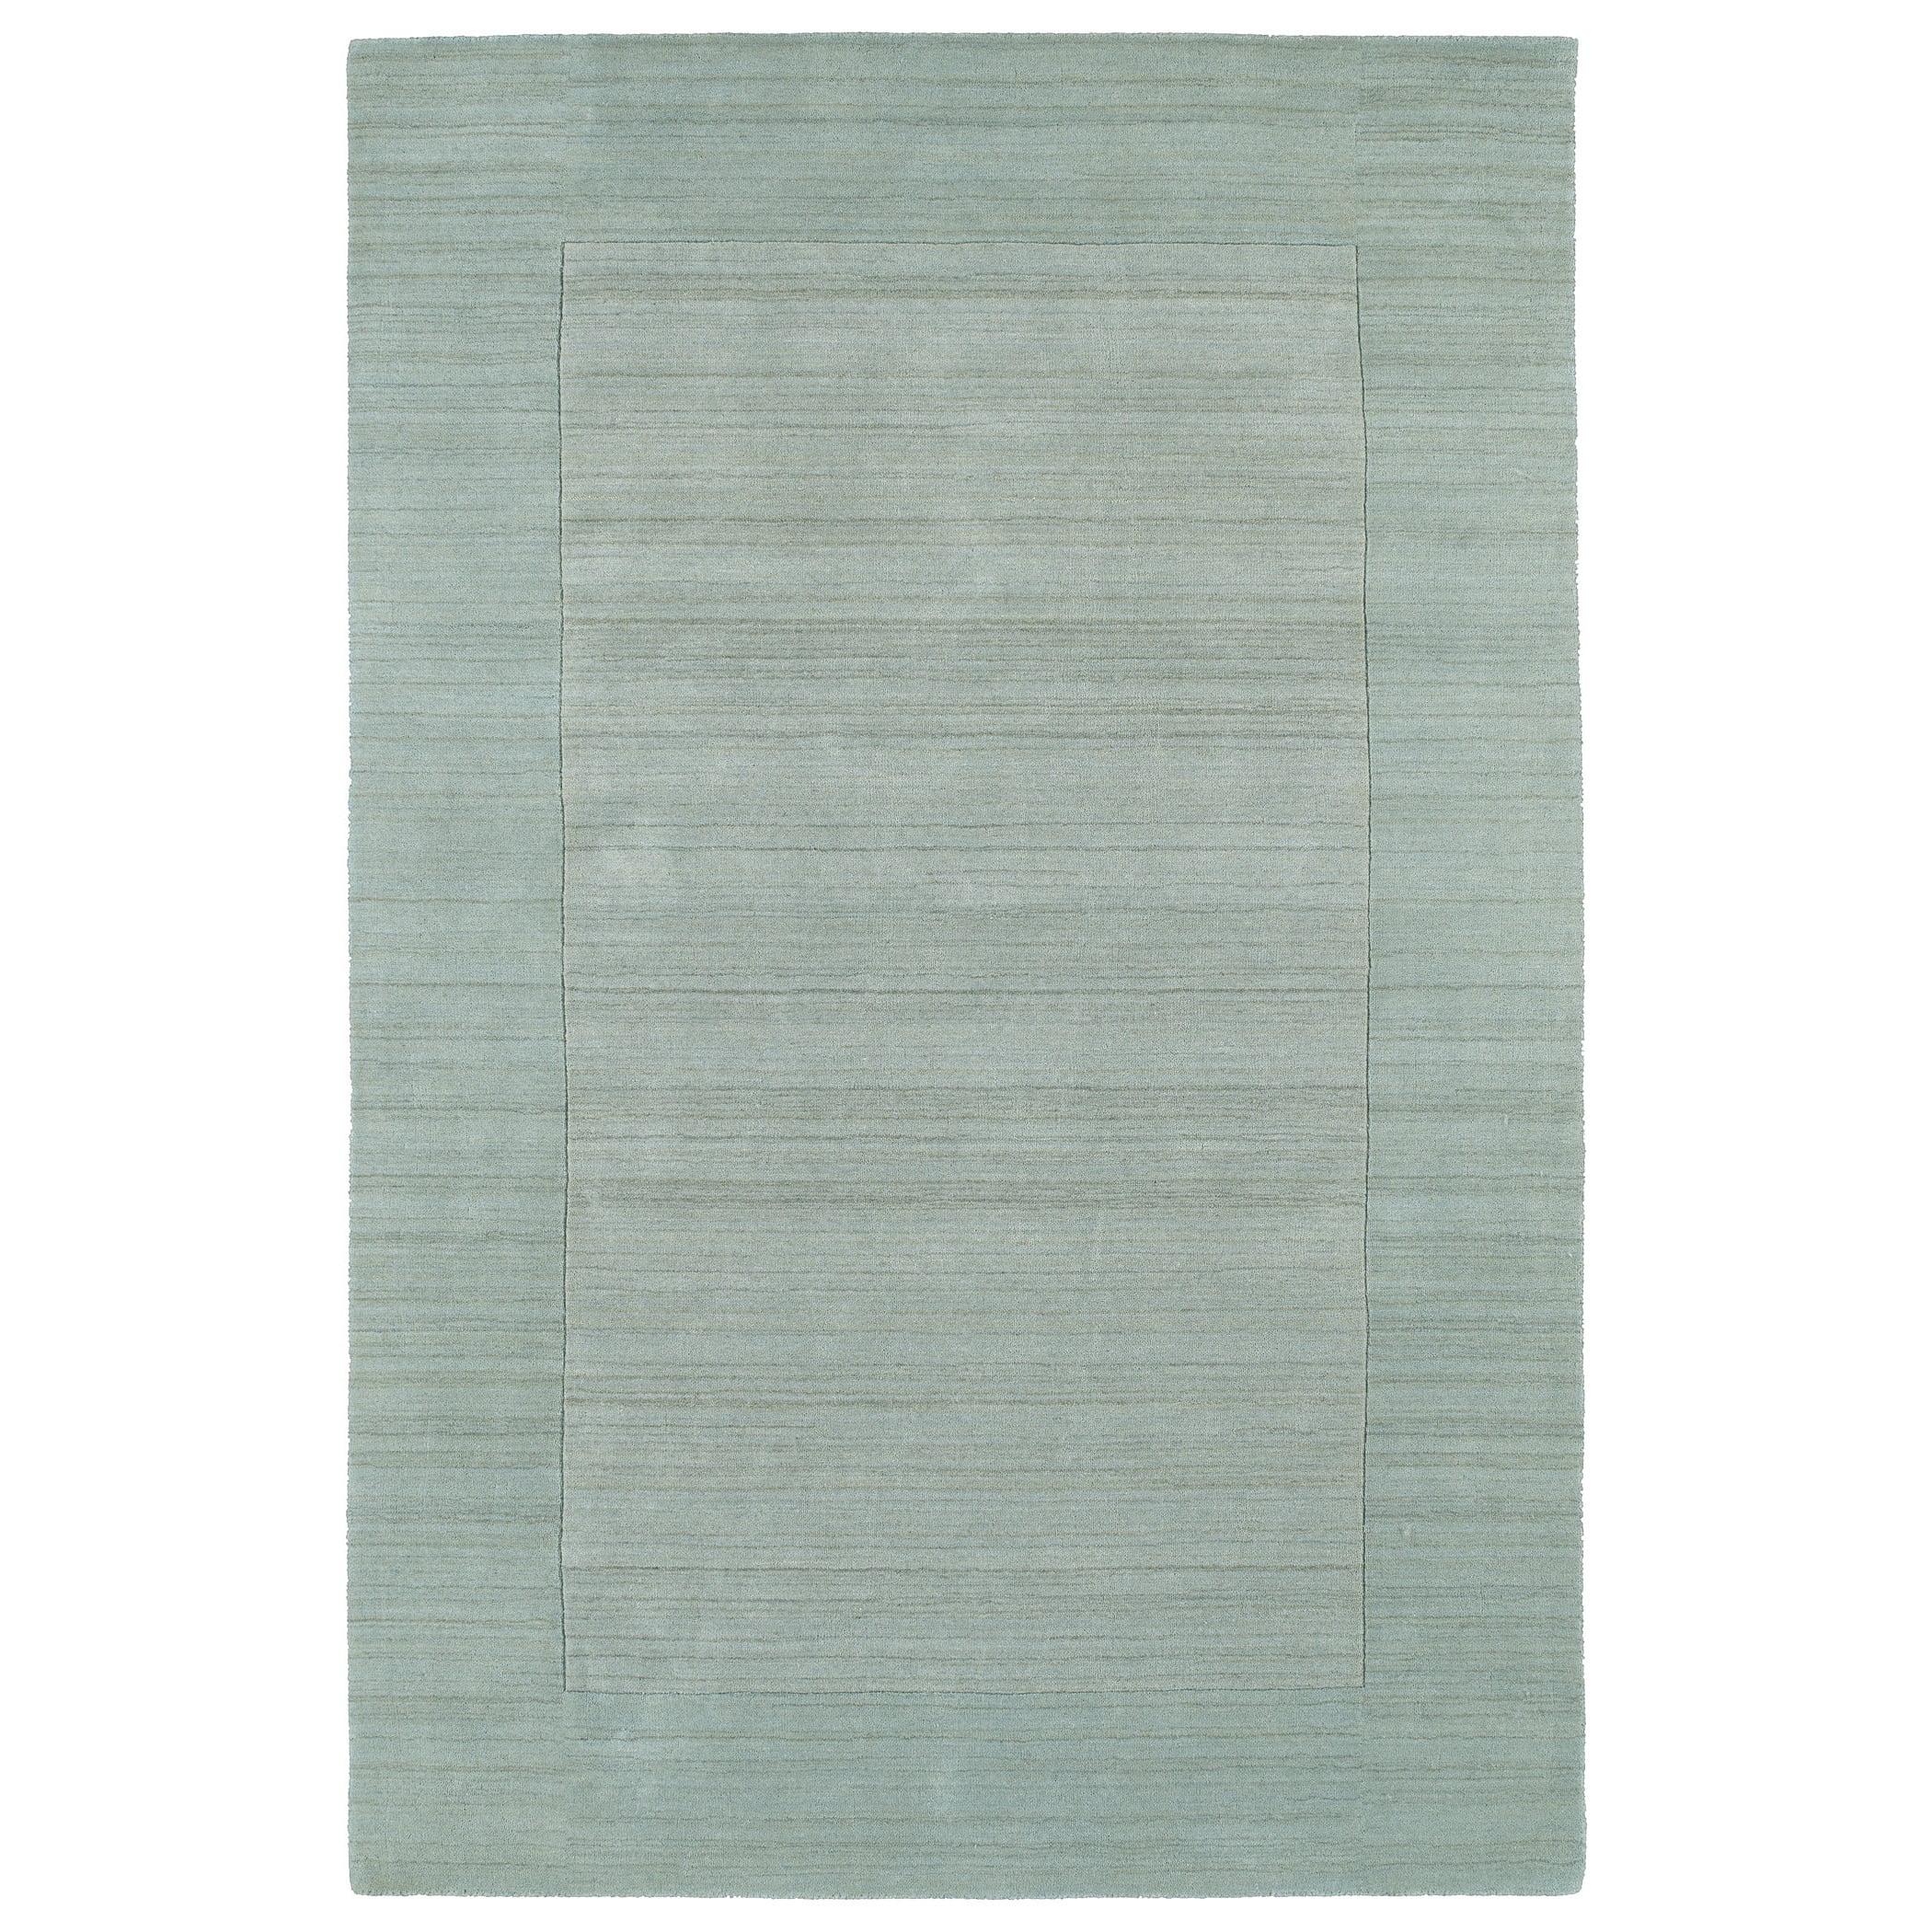 Kaleen Rugs Borders Spa Hand-Tufted Wool Rug (8'0 x 10'0)